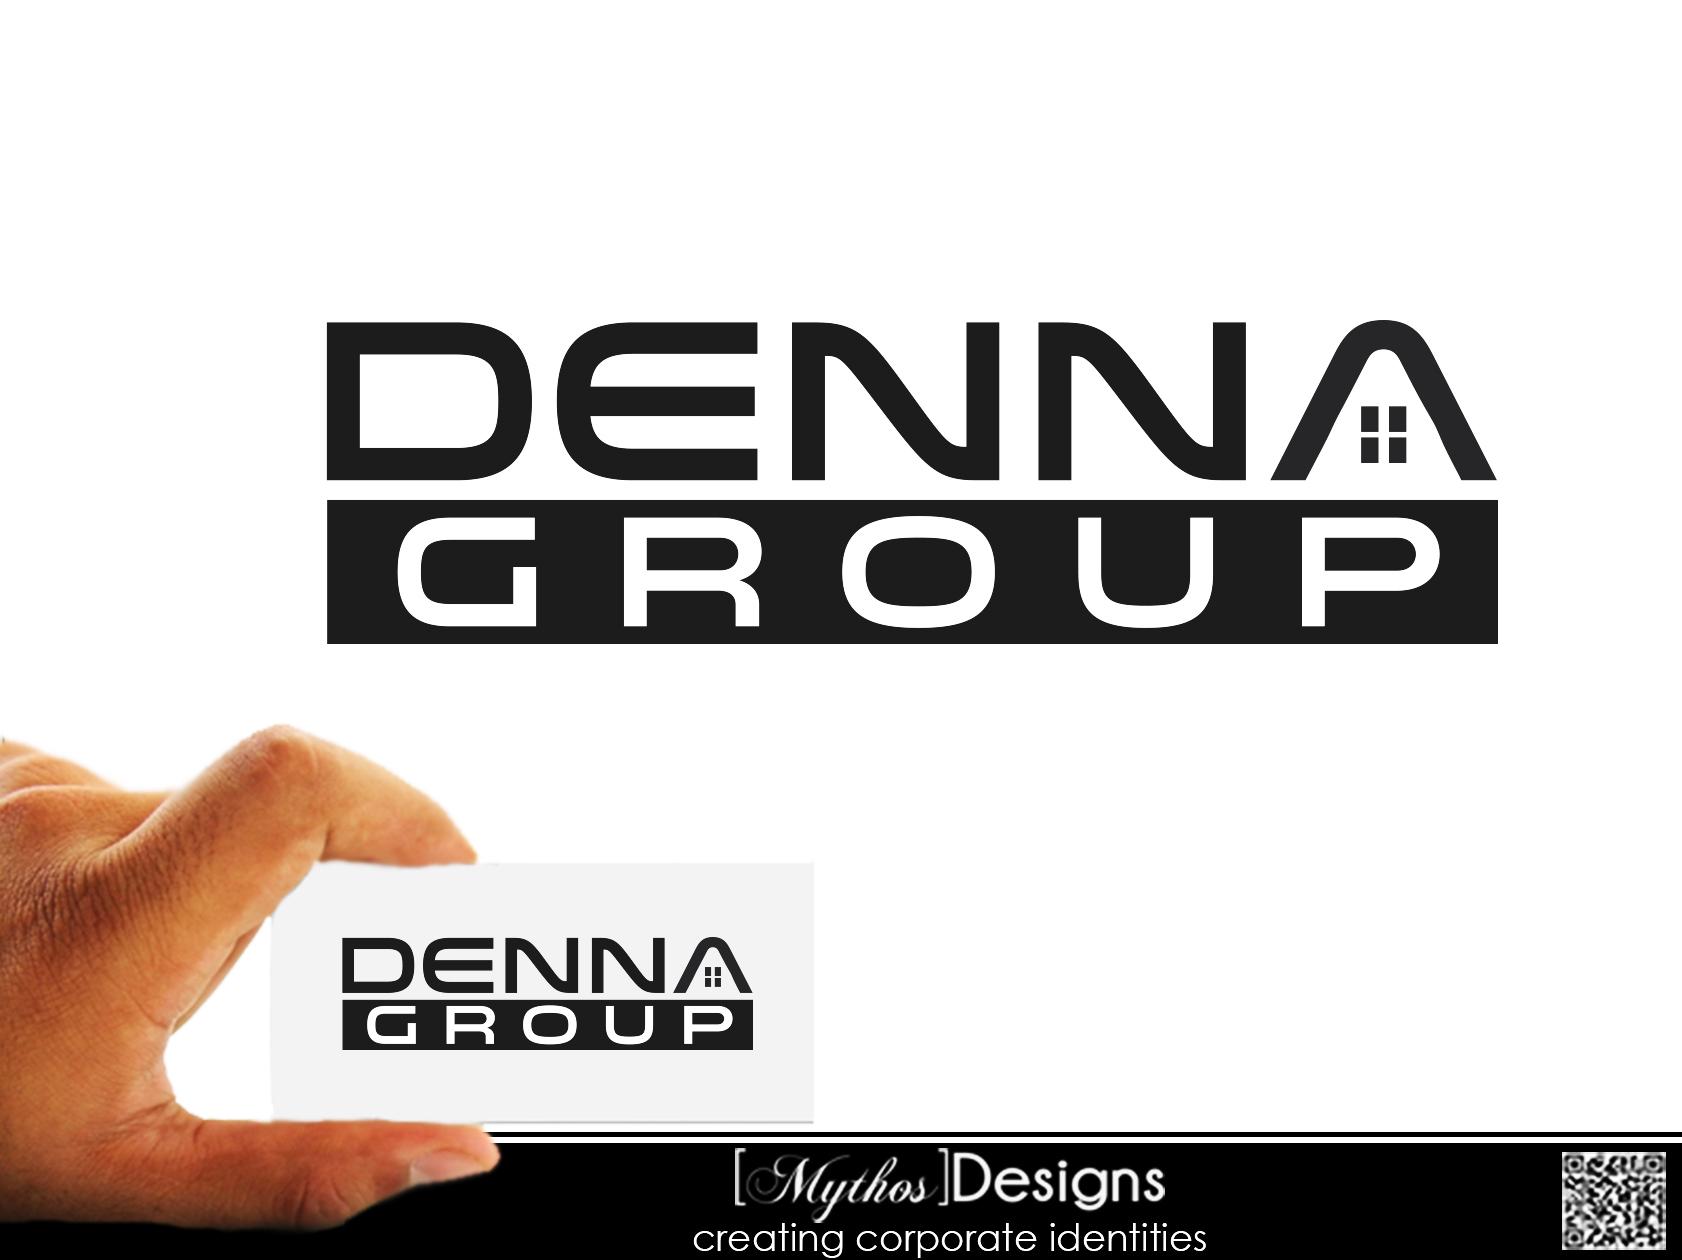 Logo Design by Mythos Designs - Entry No. 248 in the Logo Design Contest Denna Group Logo Design.